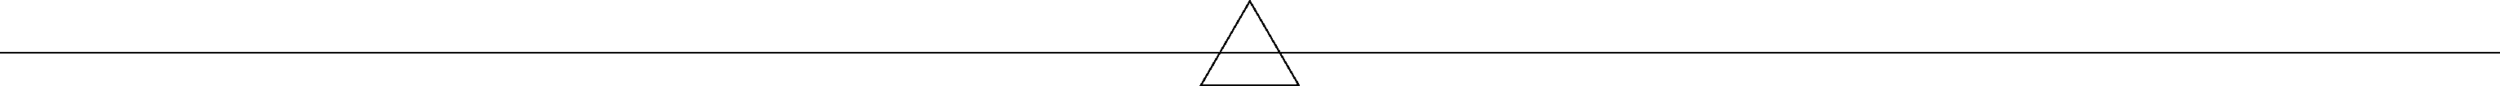 triangle-divider